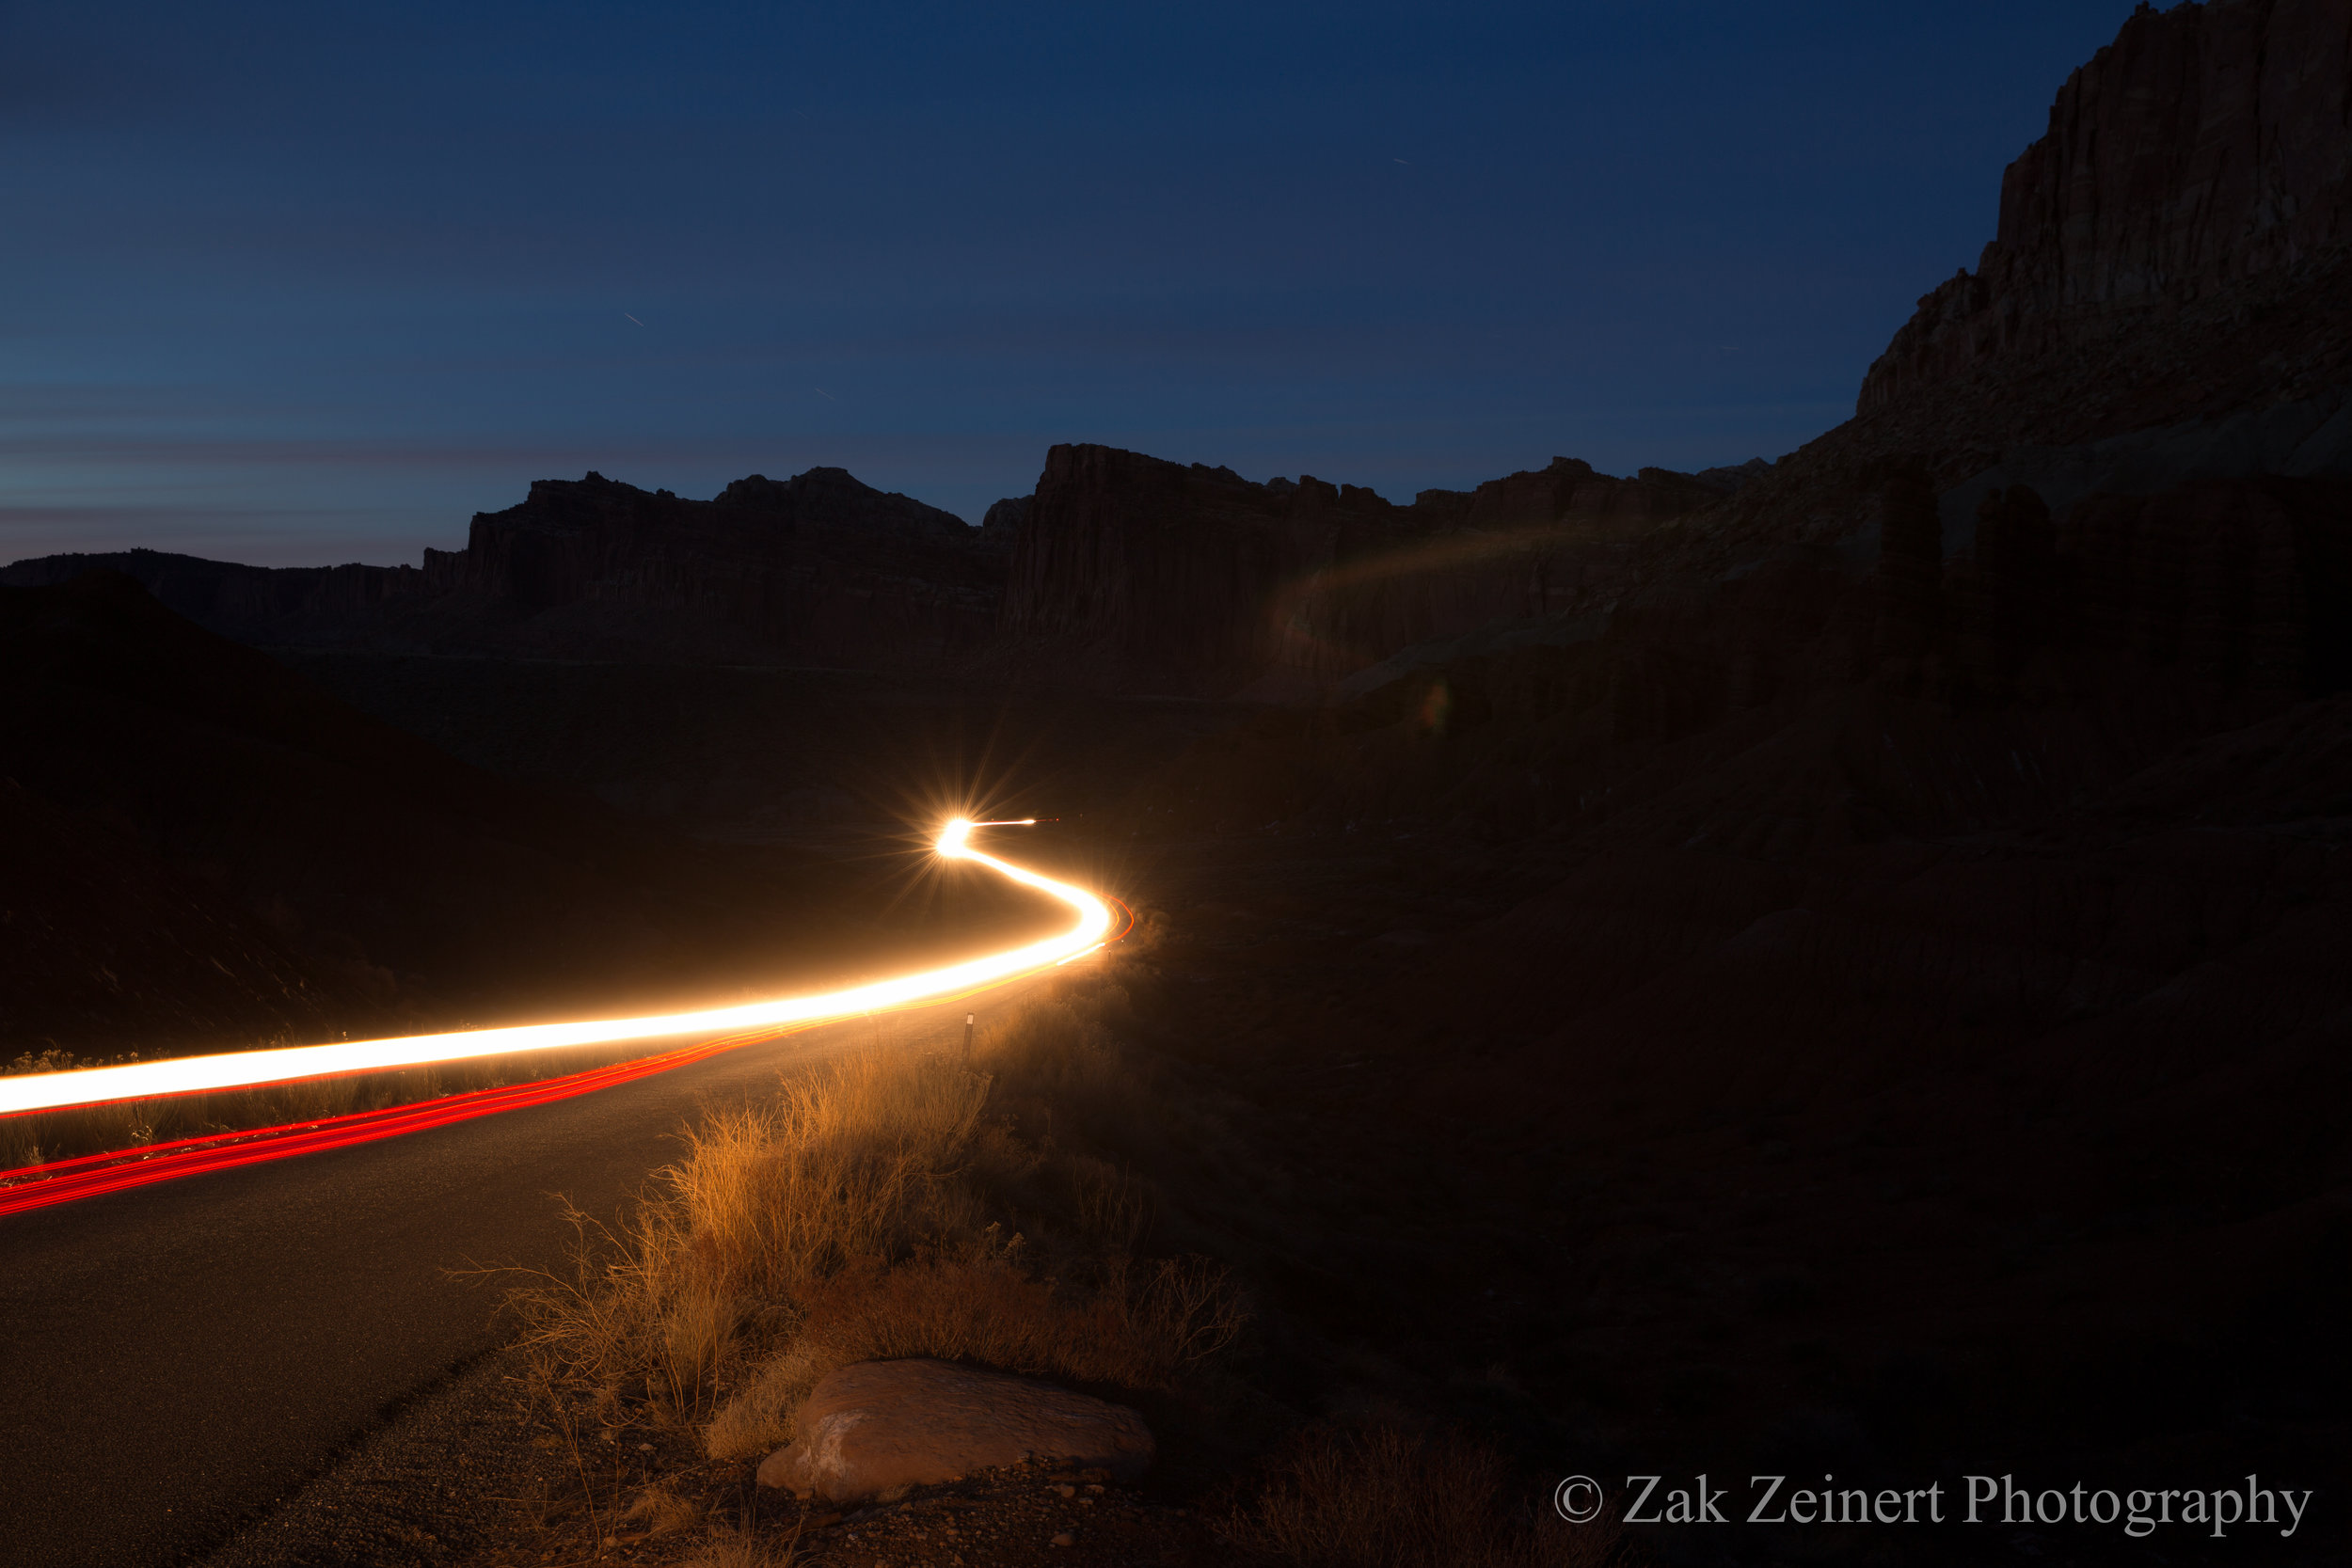 Single light trail shot